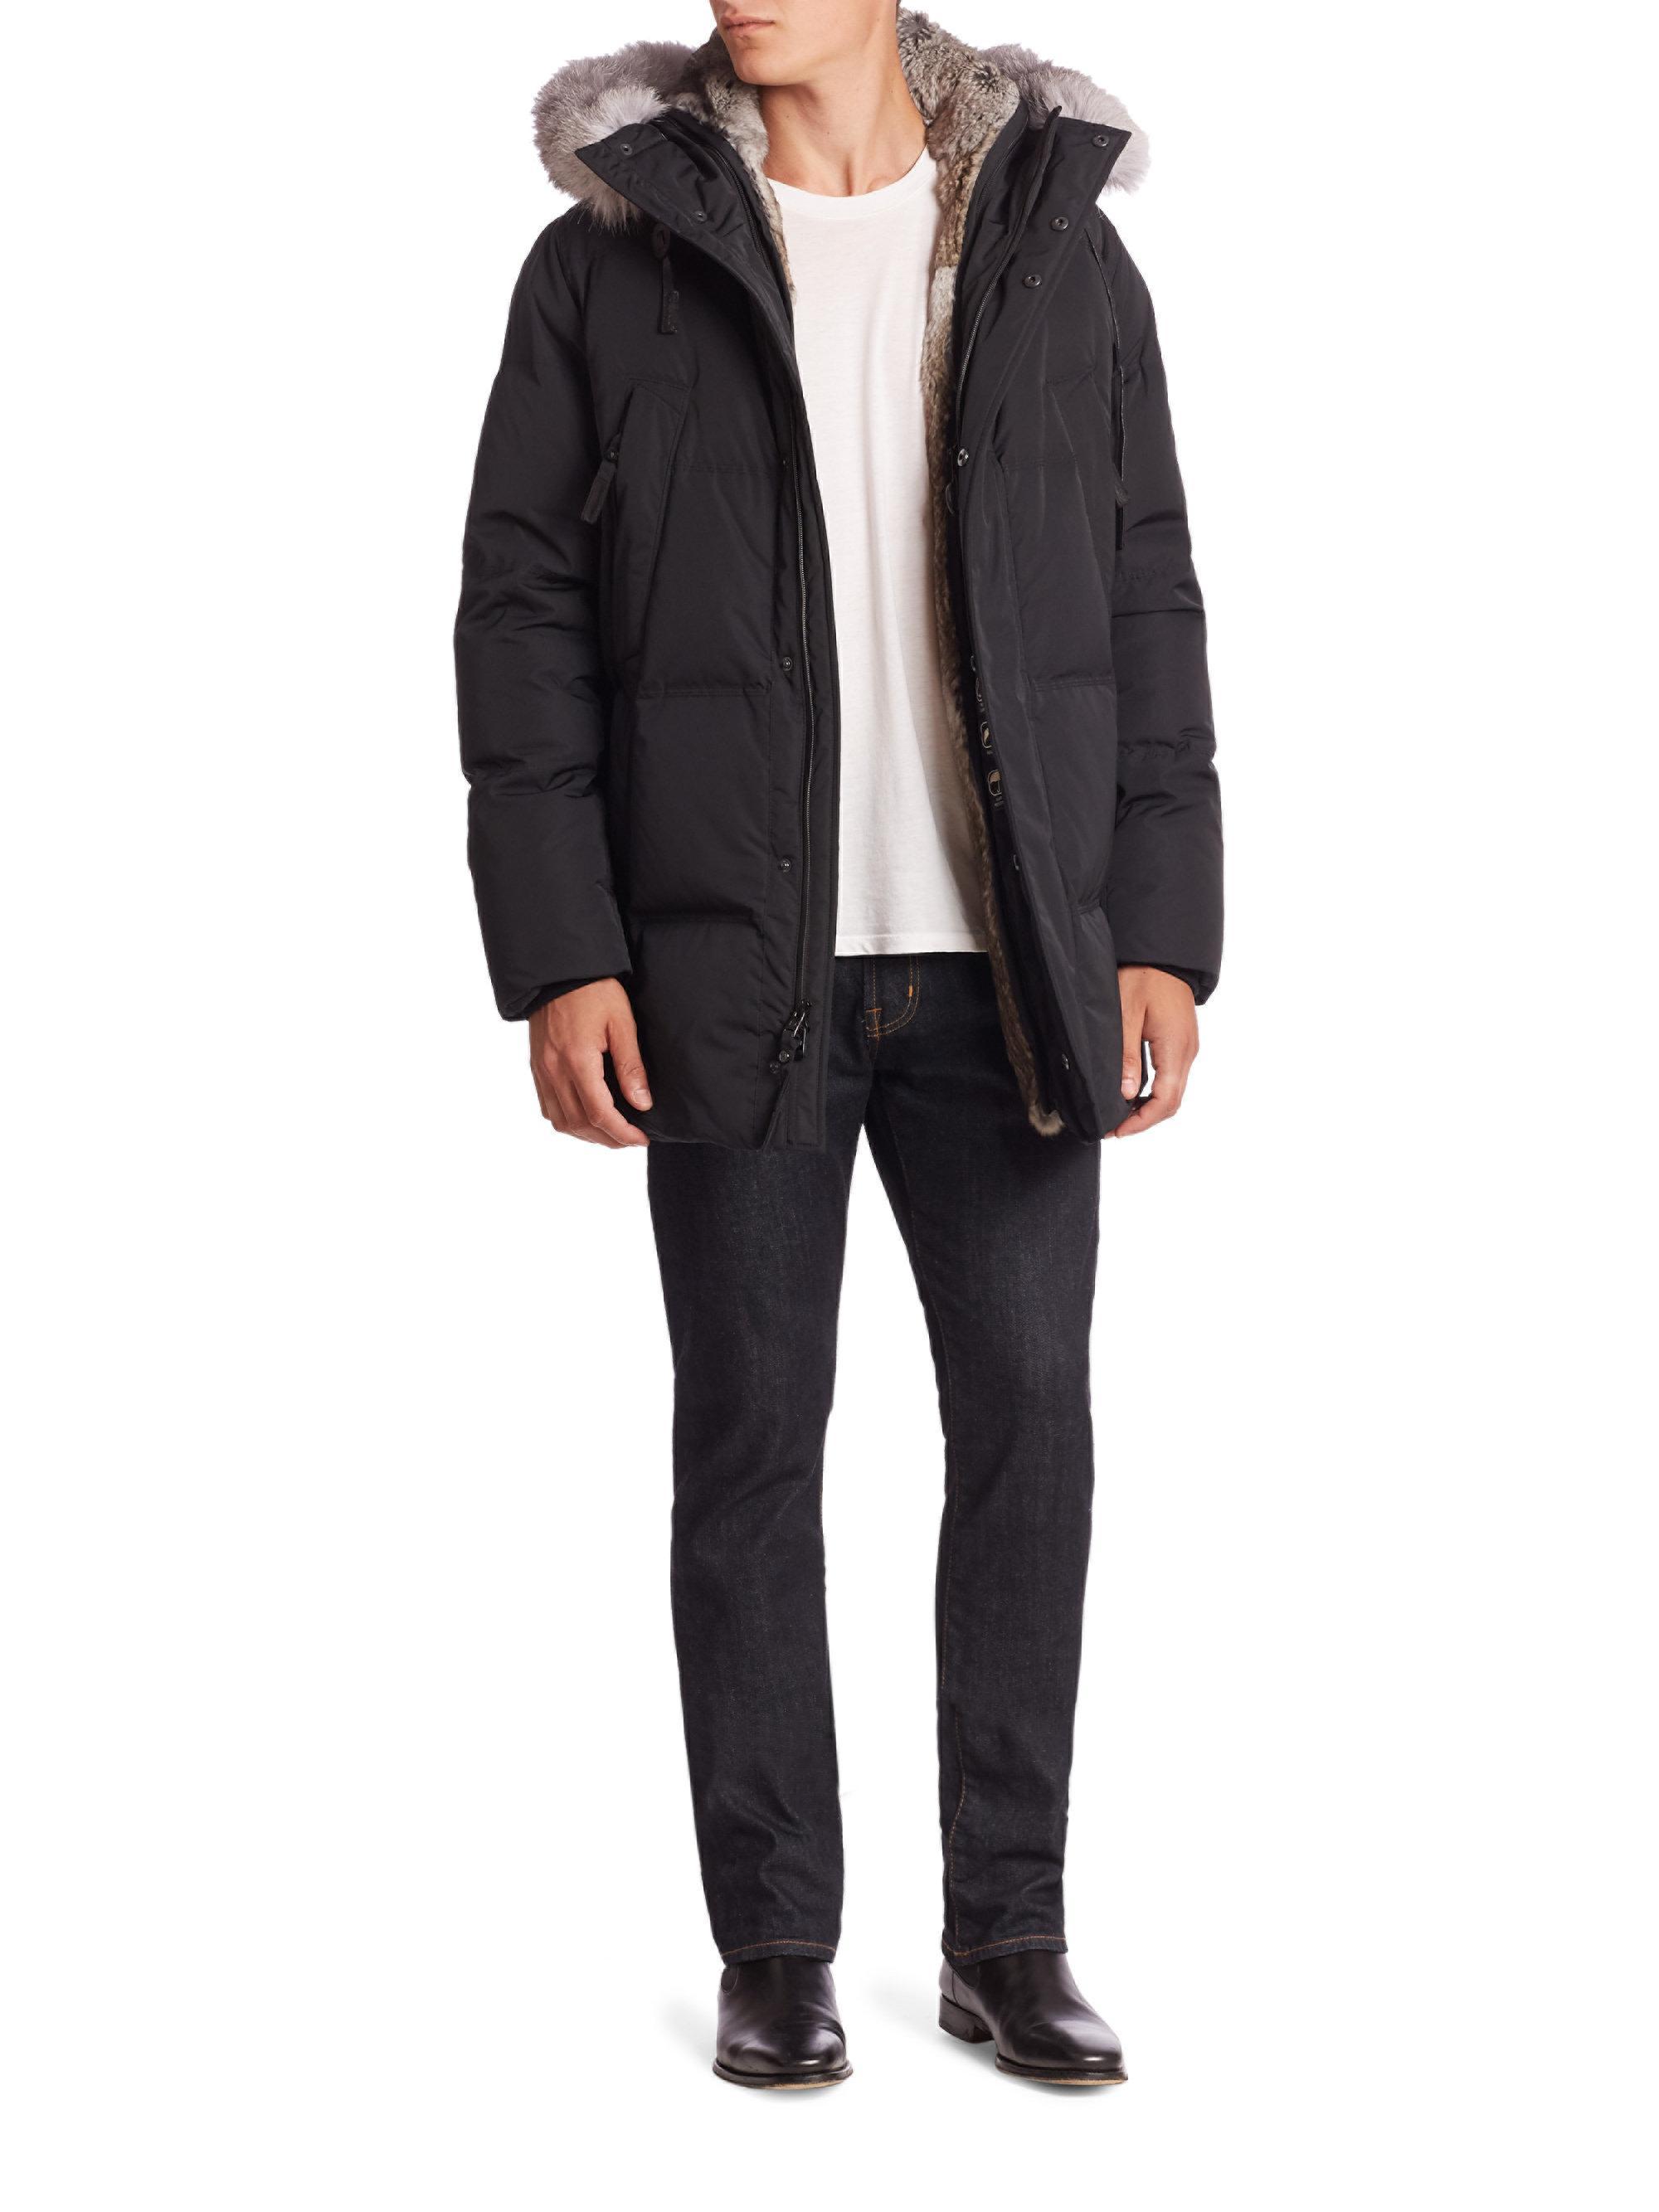 Andrew Marc Freezer Rabbit Fur Jacket in Black for Men - Lyst